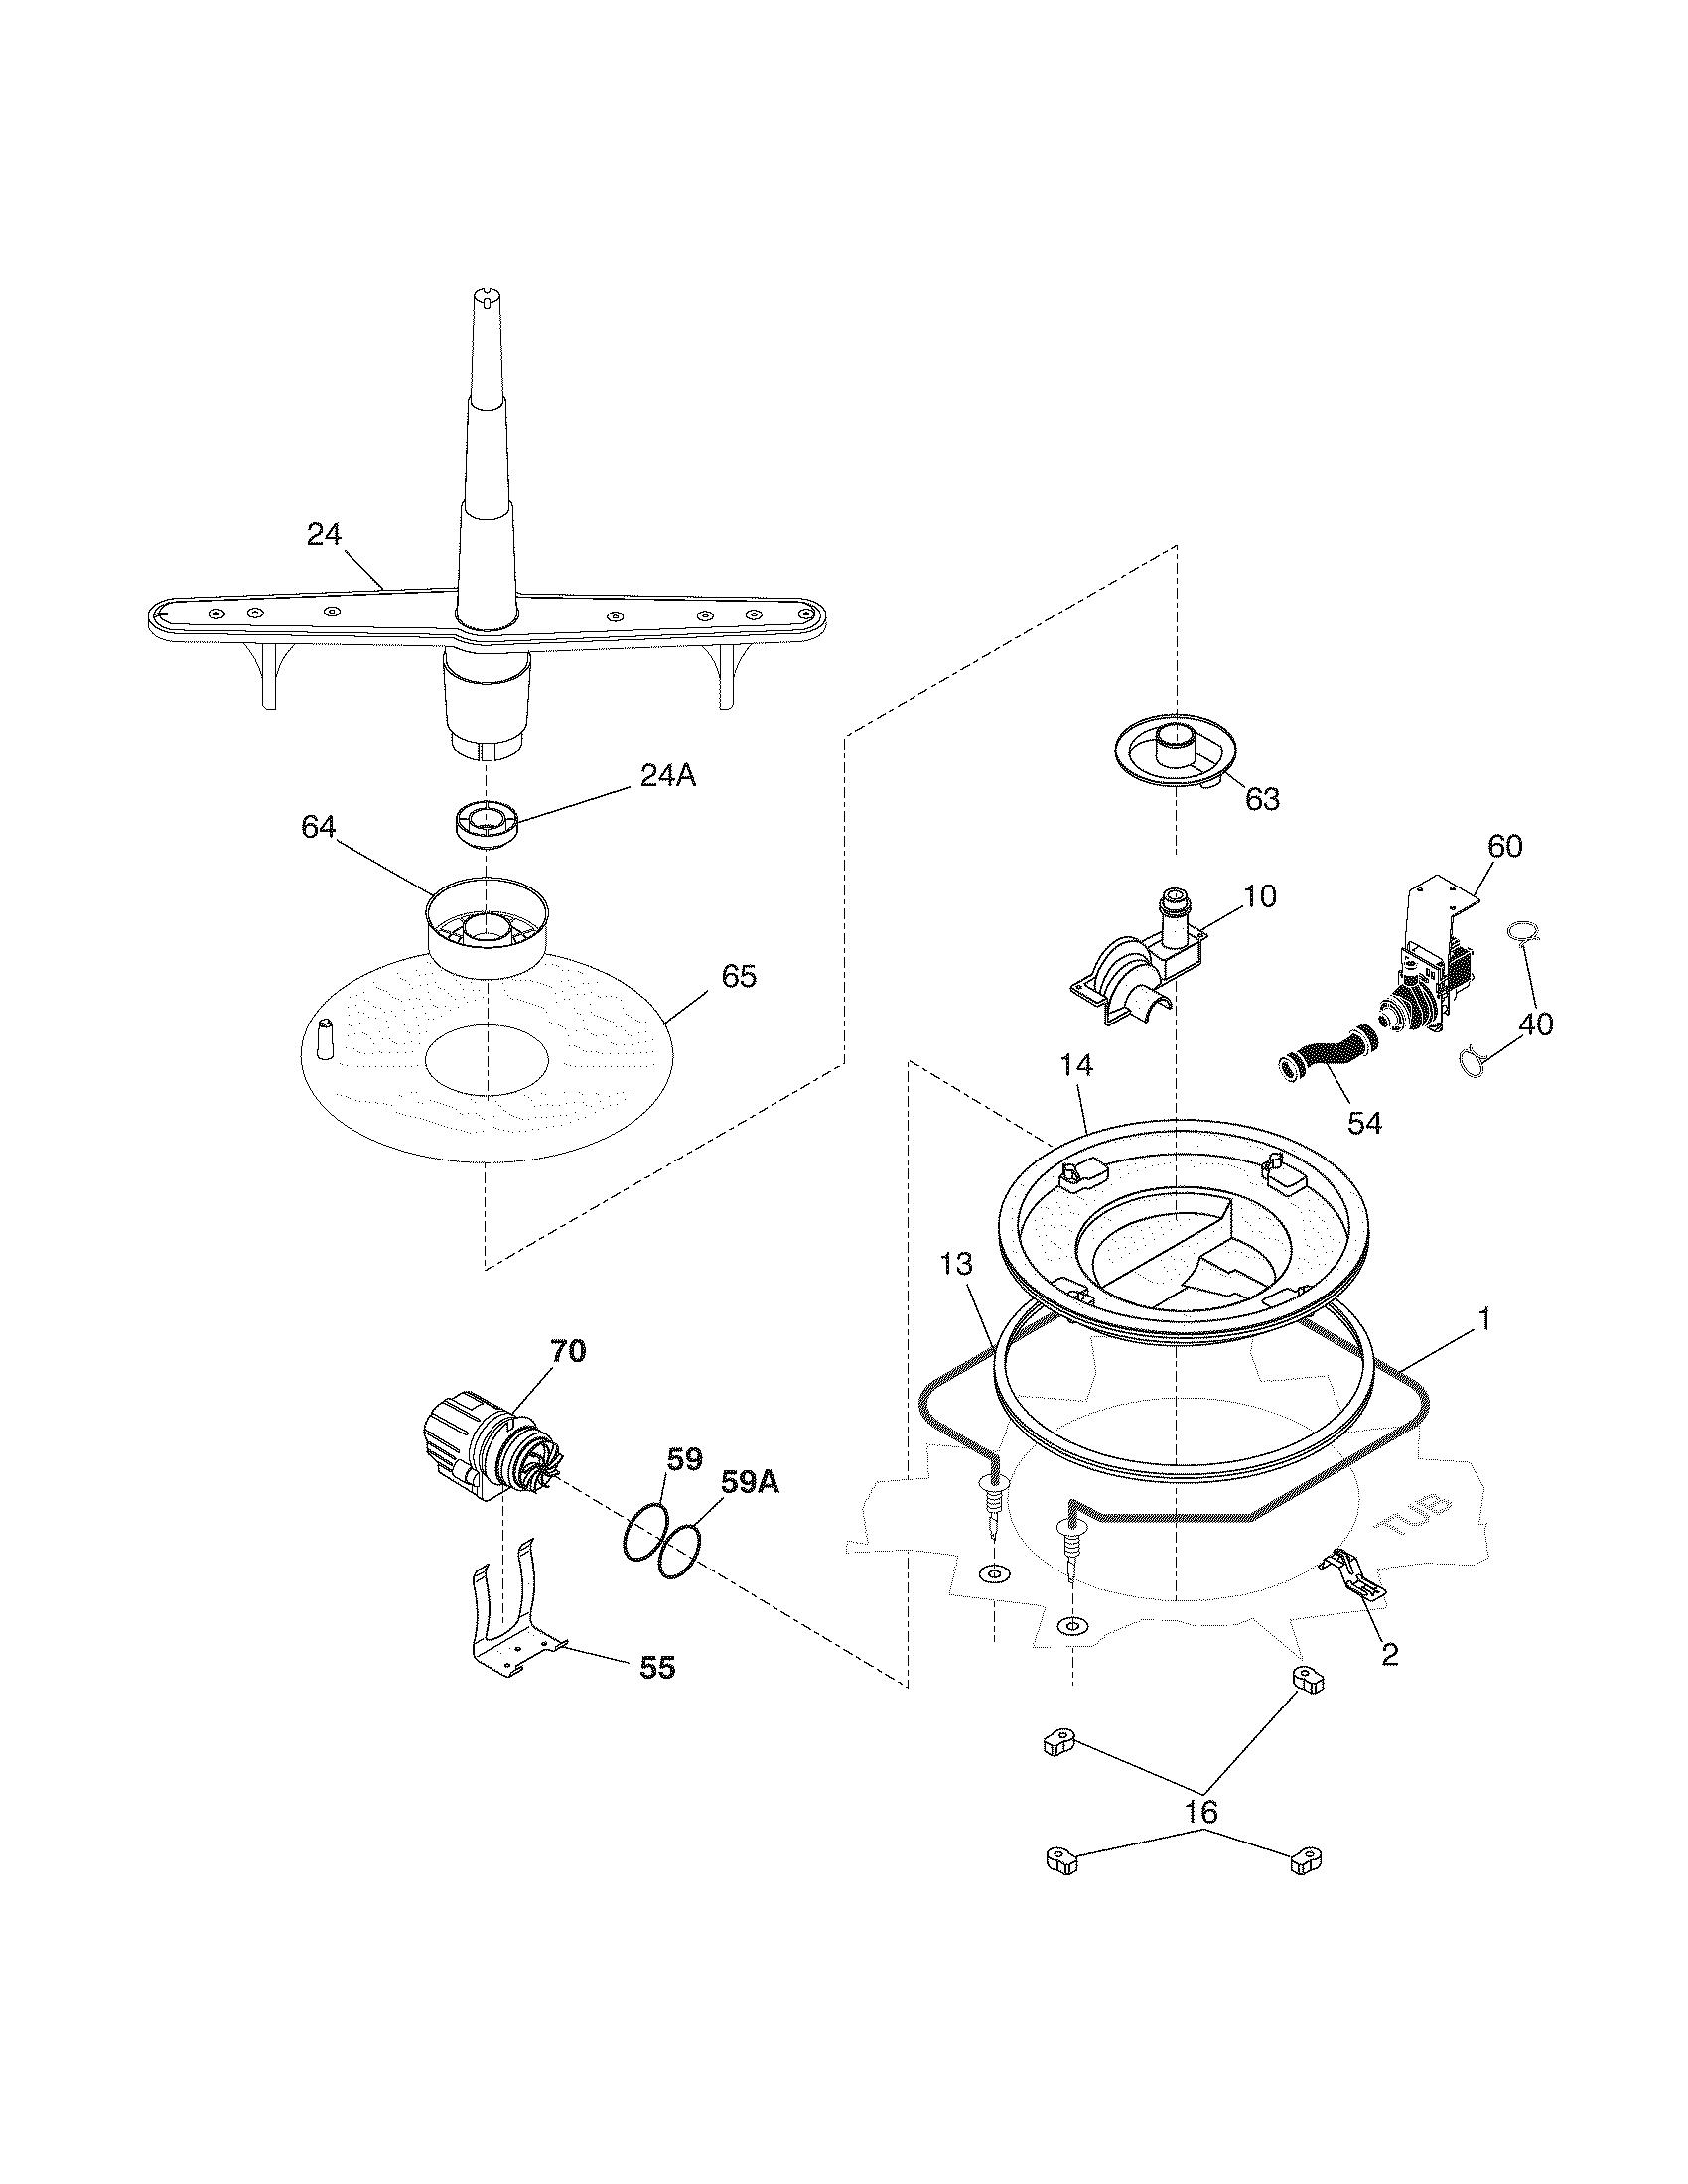 Frigidaire model FDB130RGS1 dishwasher genuine parts